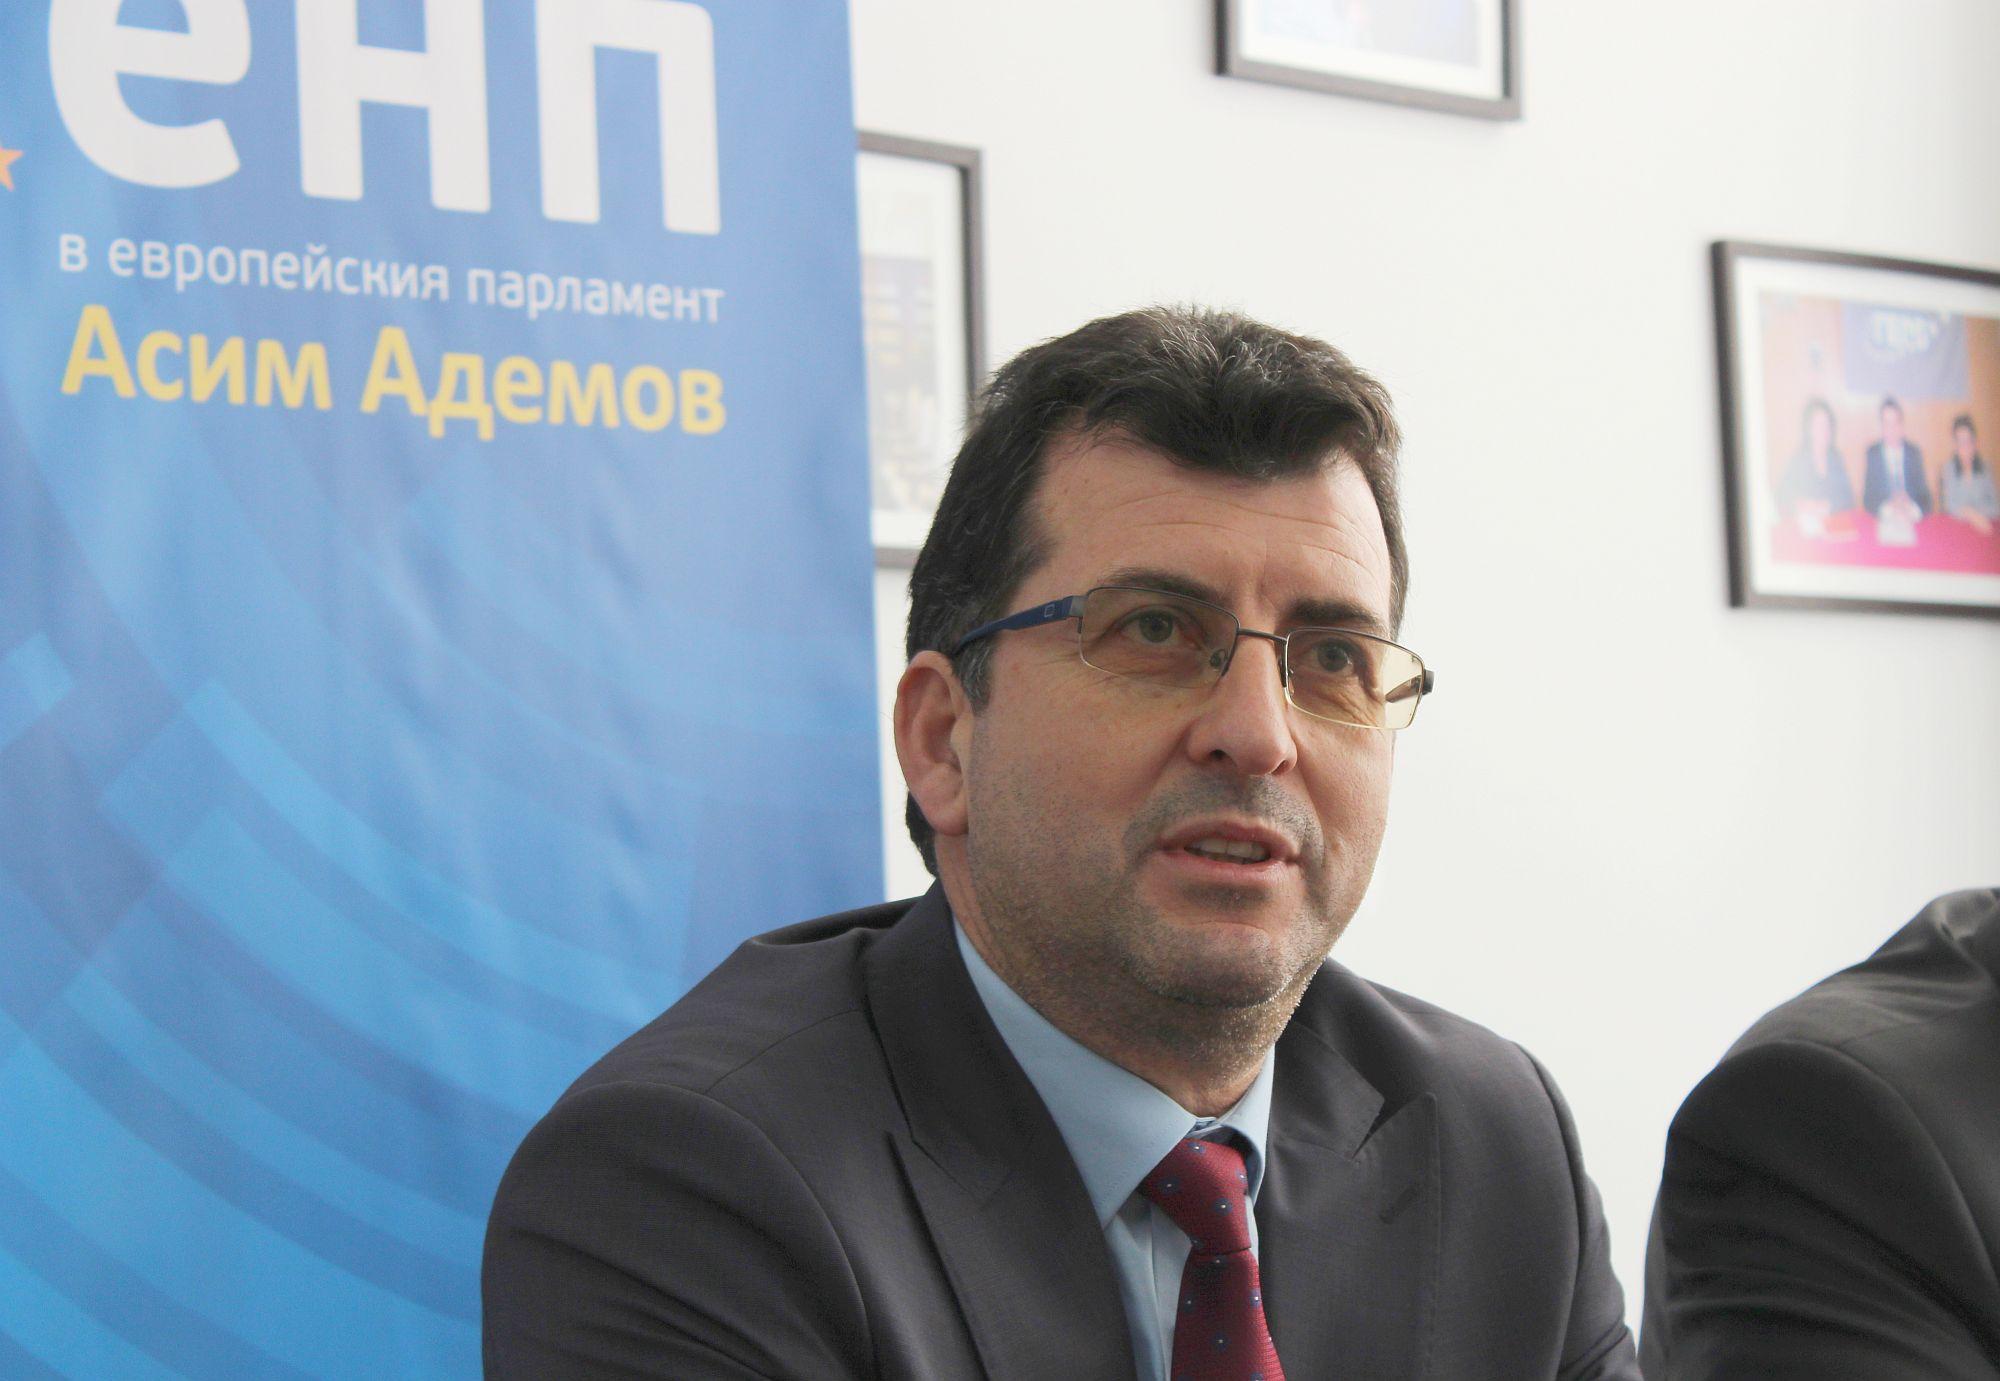 Евродепутатът Асим Адемов ще посети Област Разград